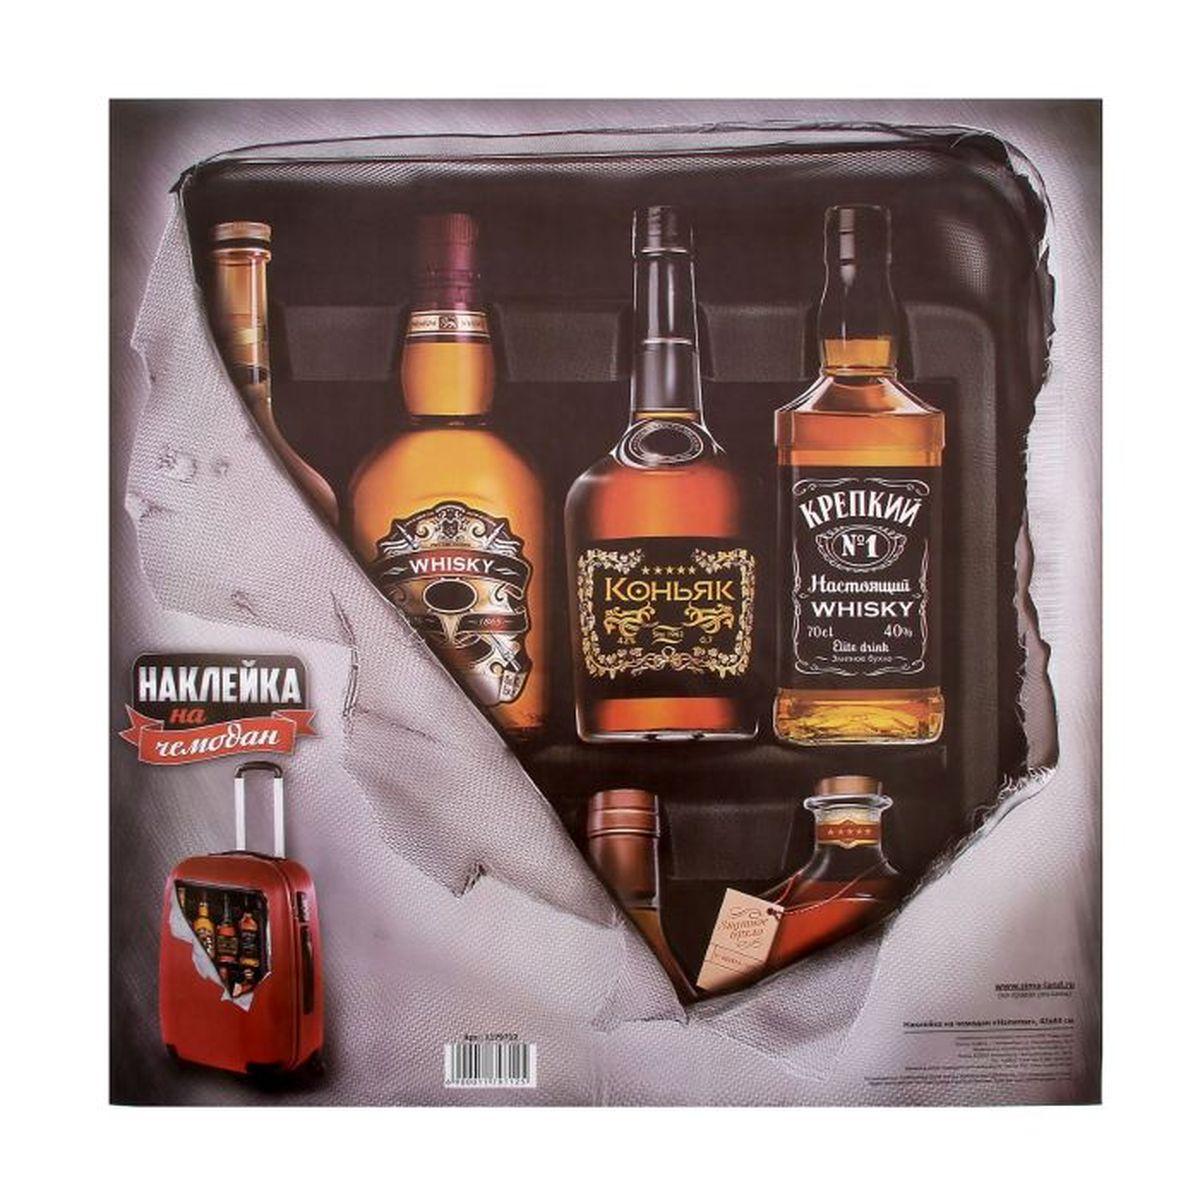 "Наклейка на чемодан Sima-land ""Напитки"", 41 х 39 см. 1179712"